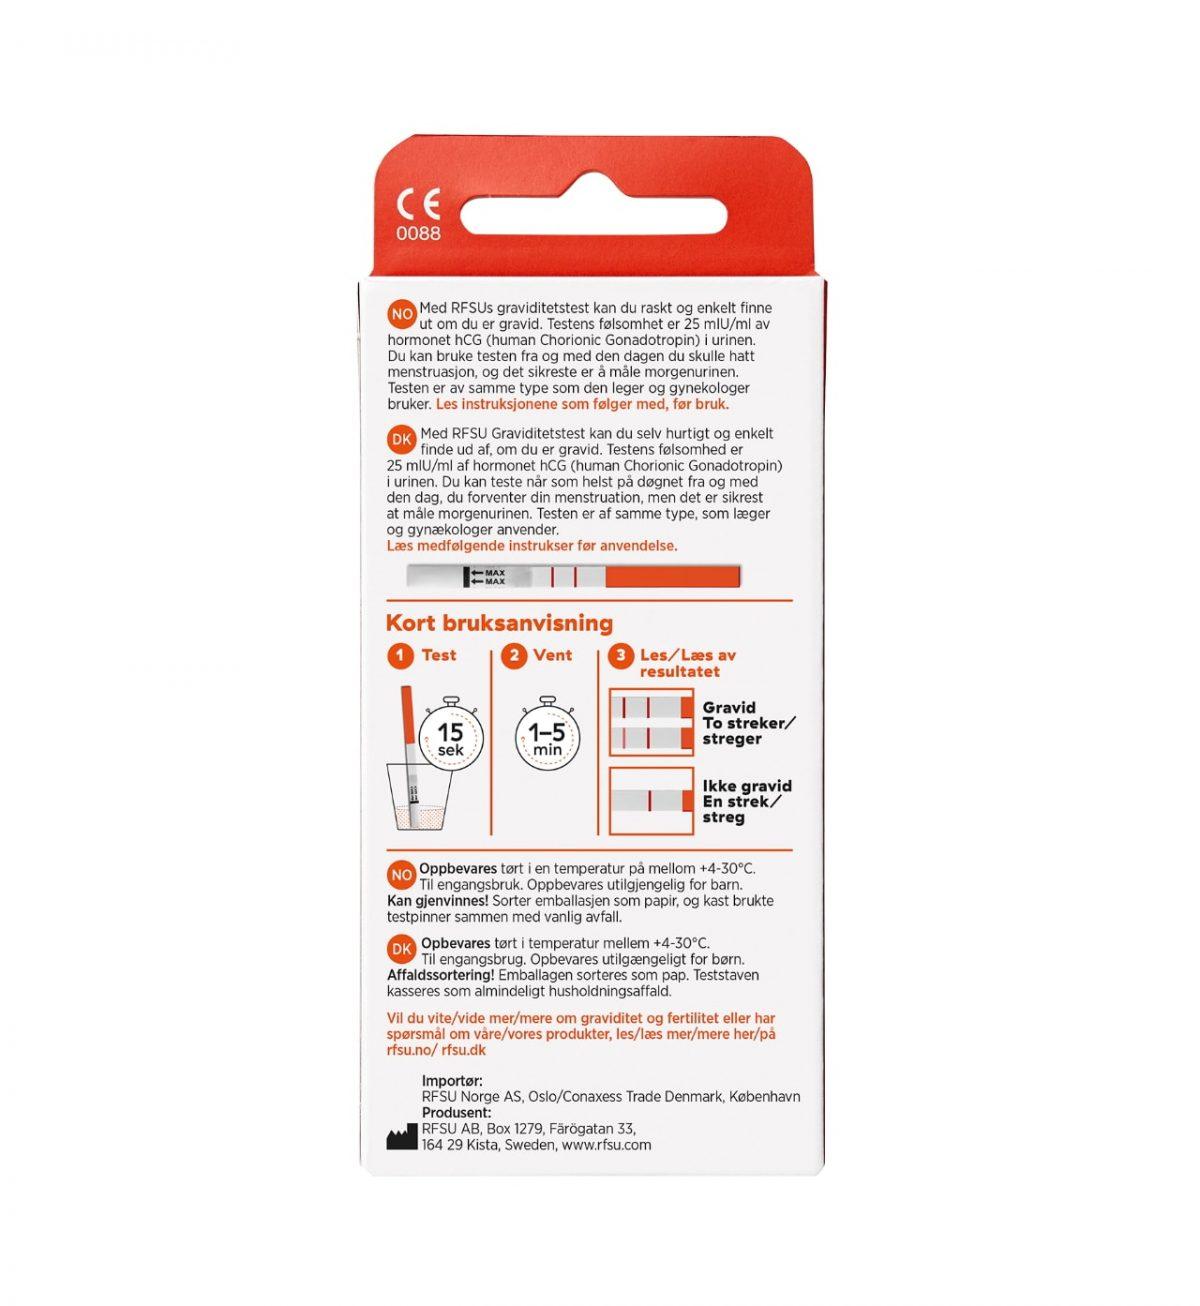 rfsu graviditesttest teste ofte 8 pack